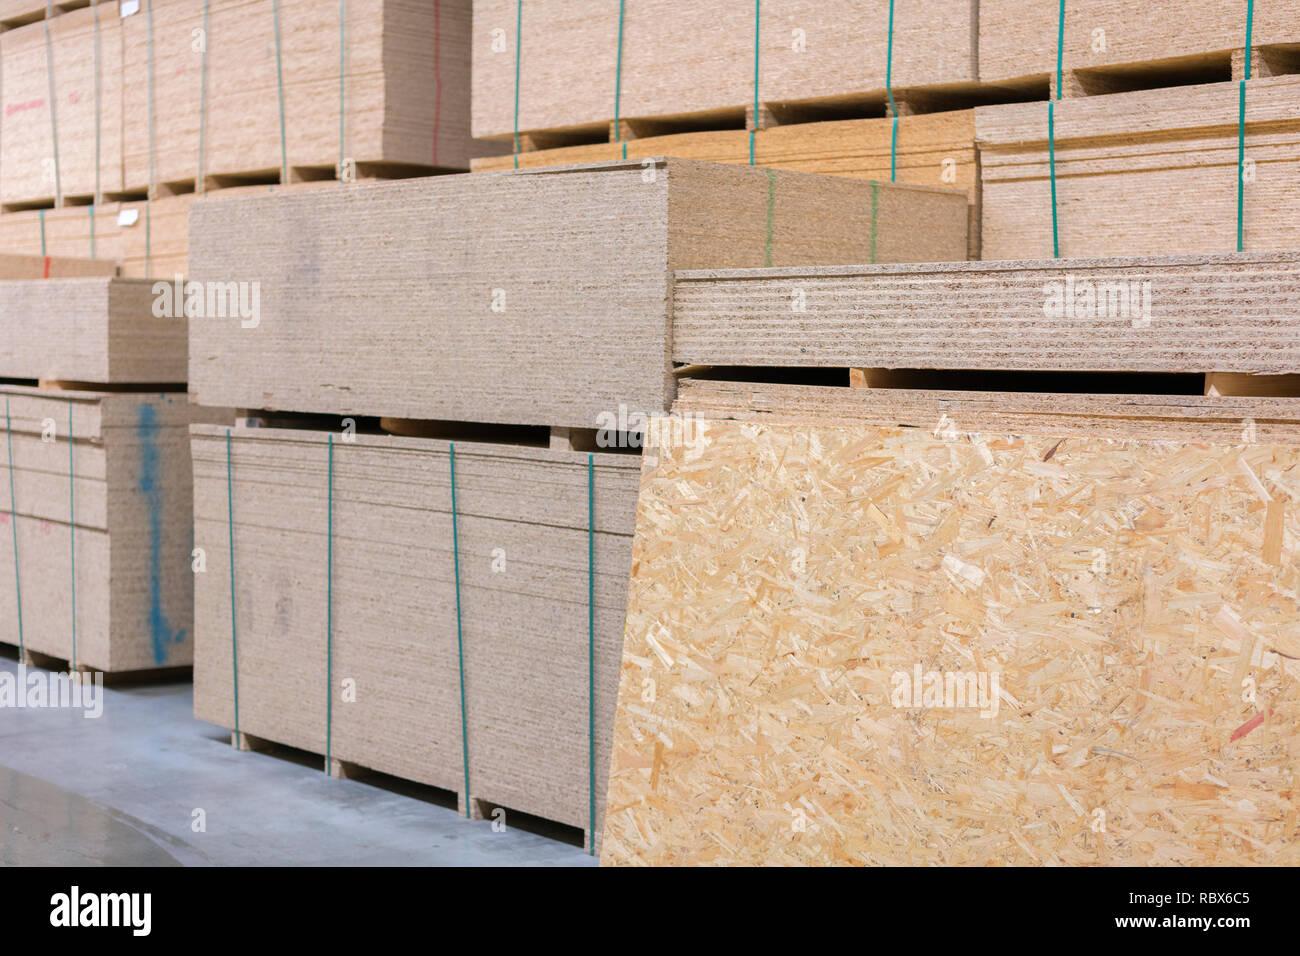 Hardware Store Shelves Stock Photos Hardware Store Shelves